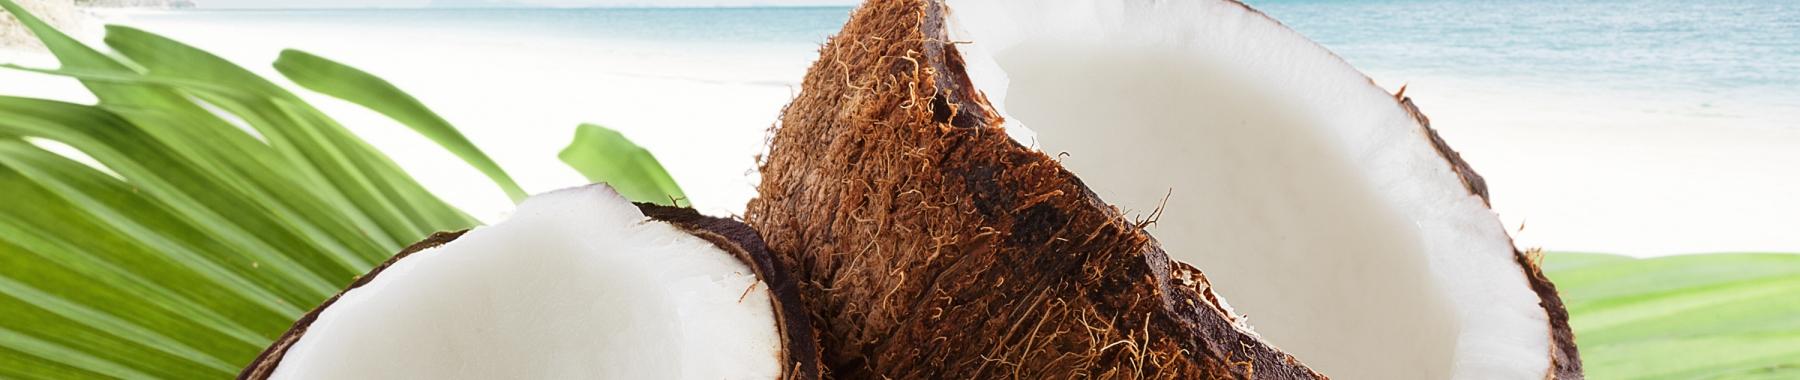 hdr-flav-coconut-1800.jpg